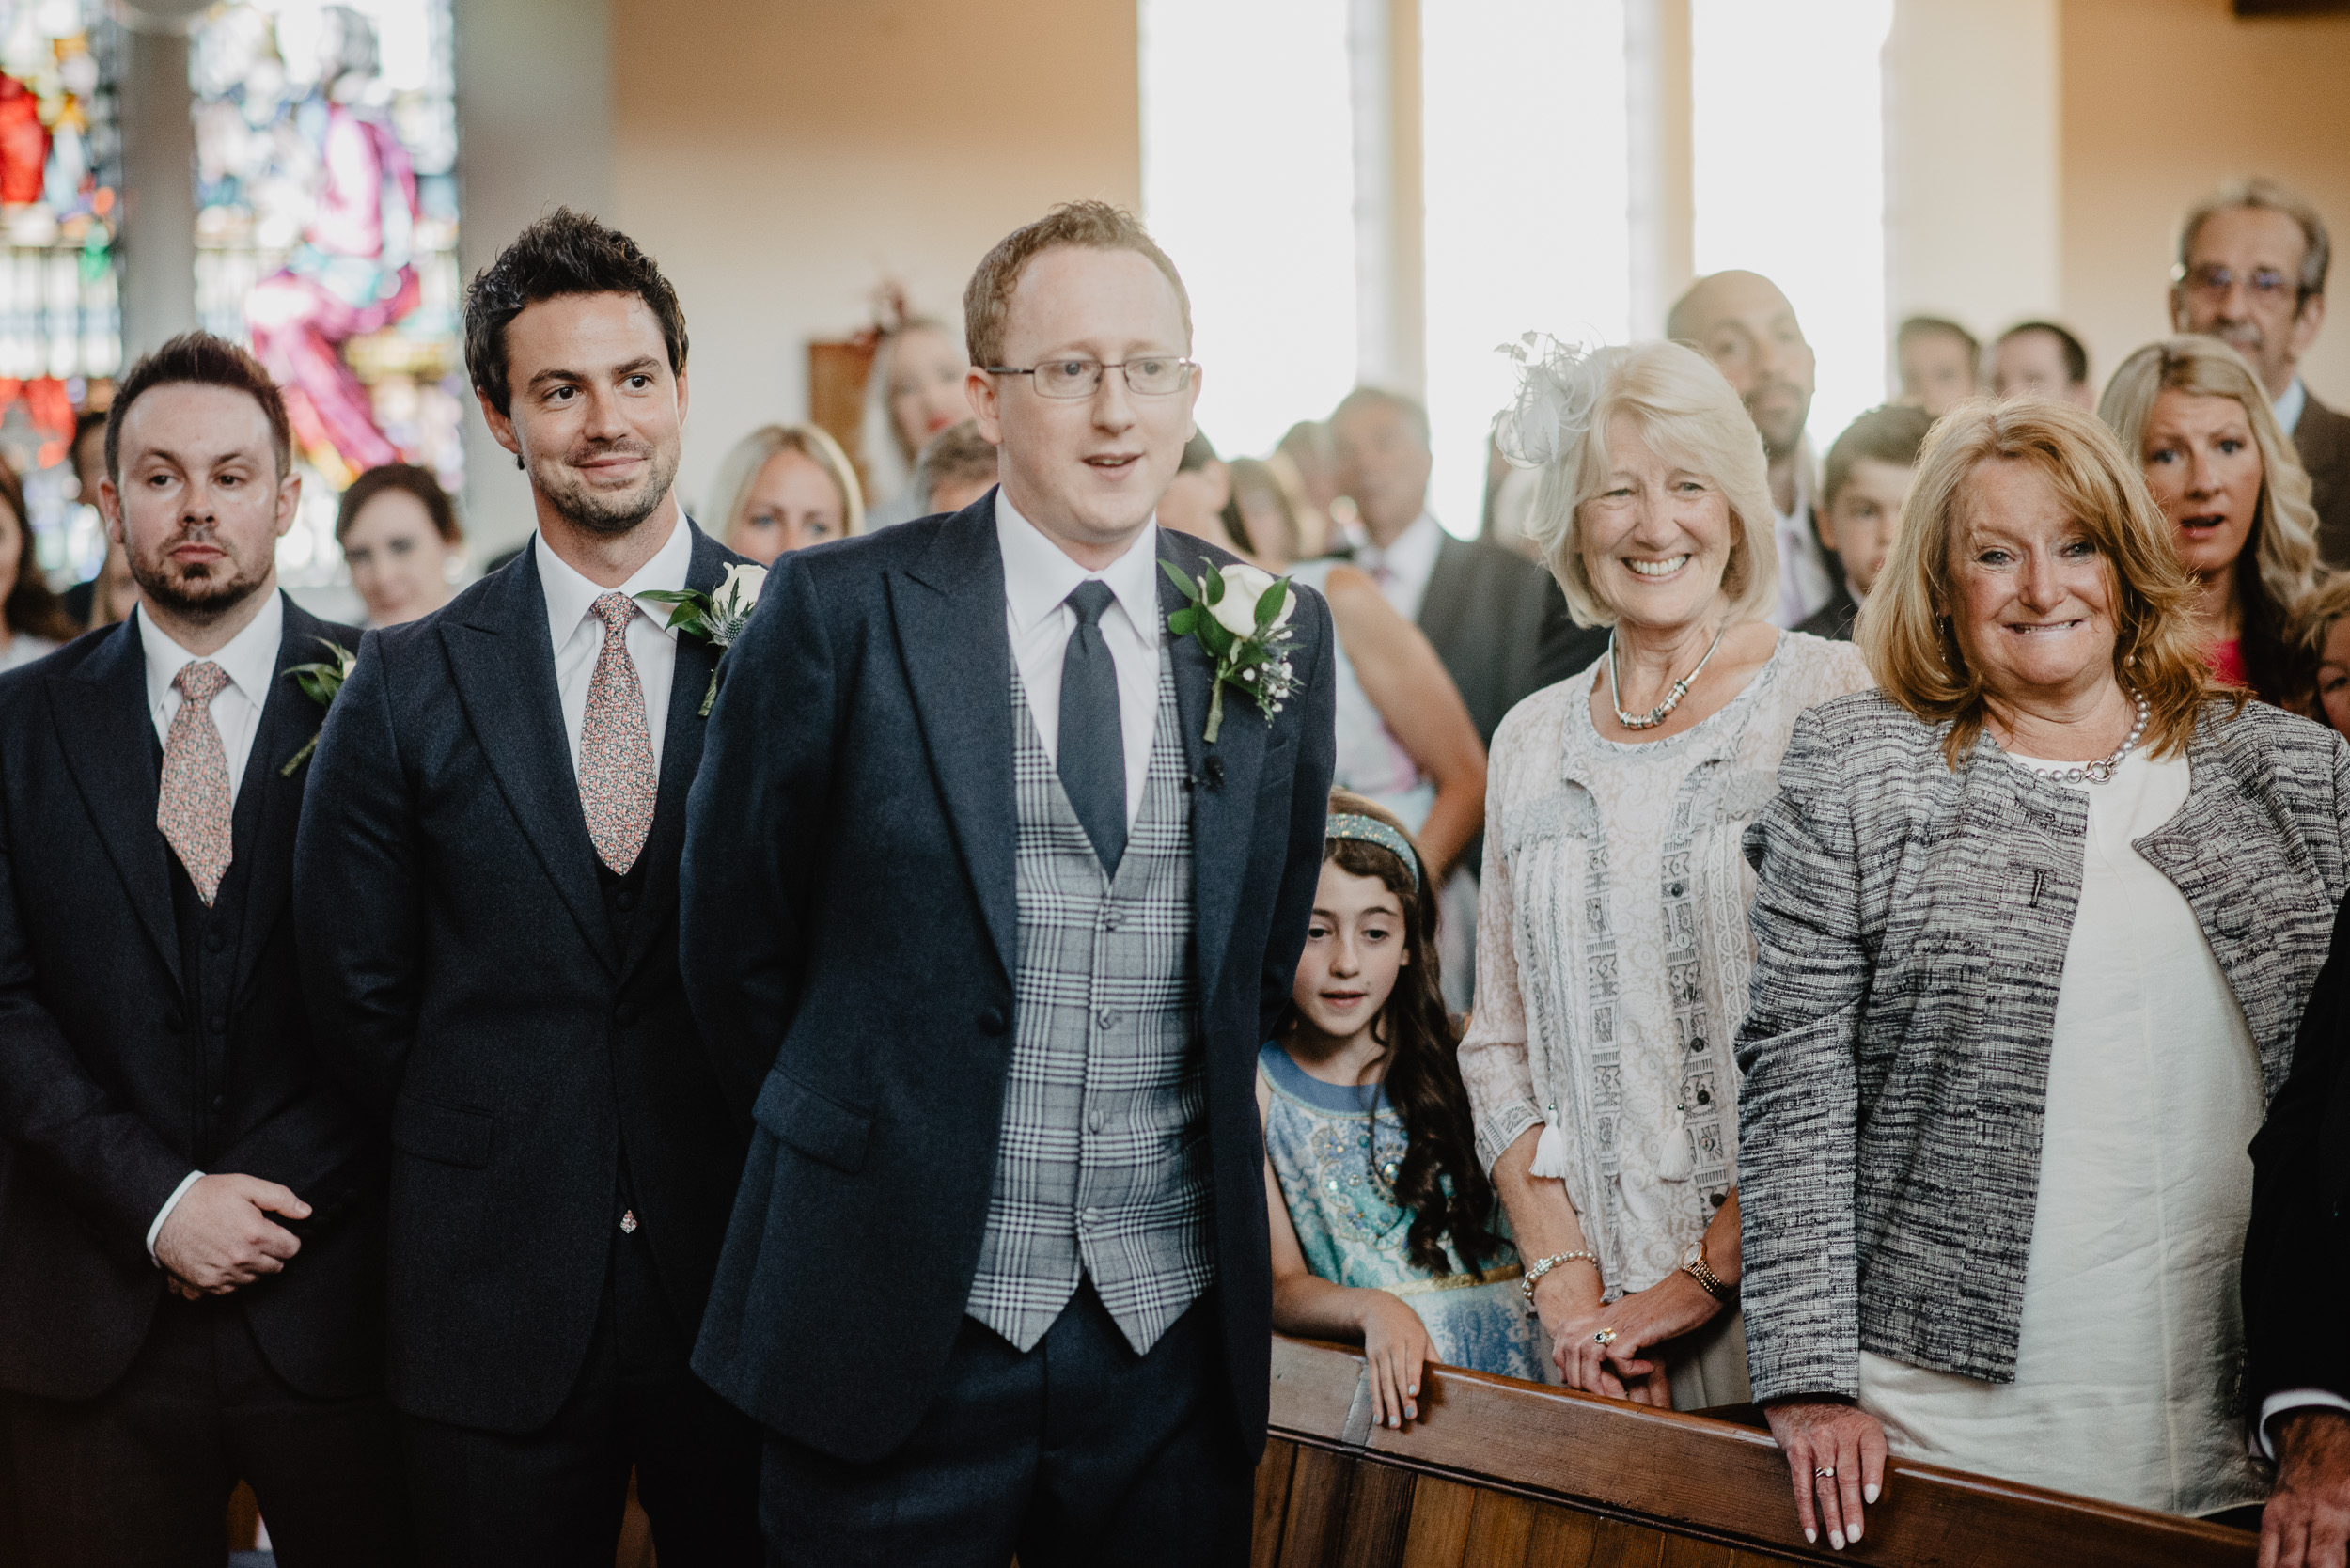 wedding photogaphy peter mackey 2018 beth-5.jpg